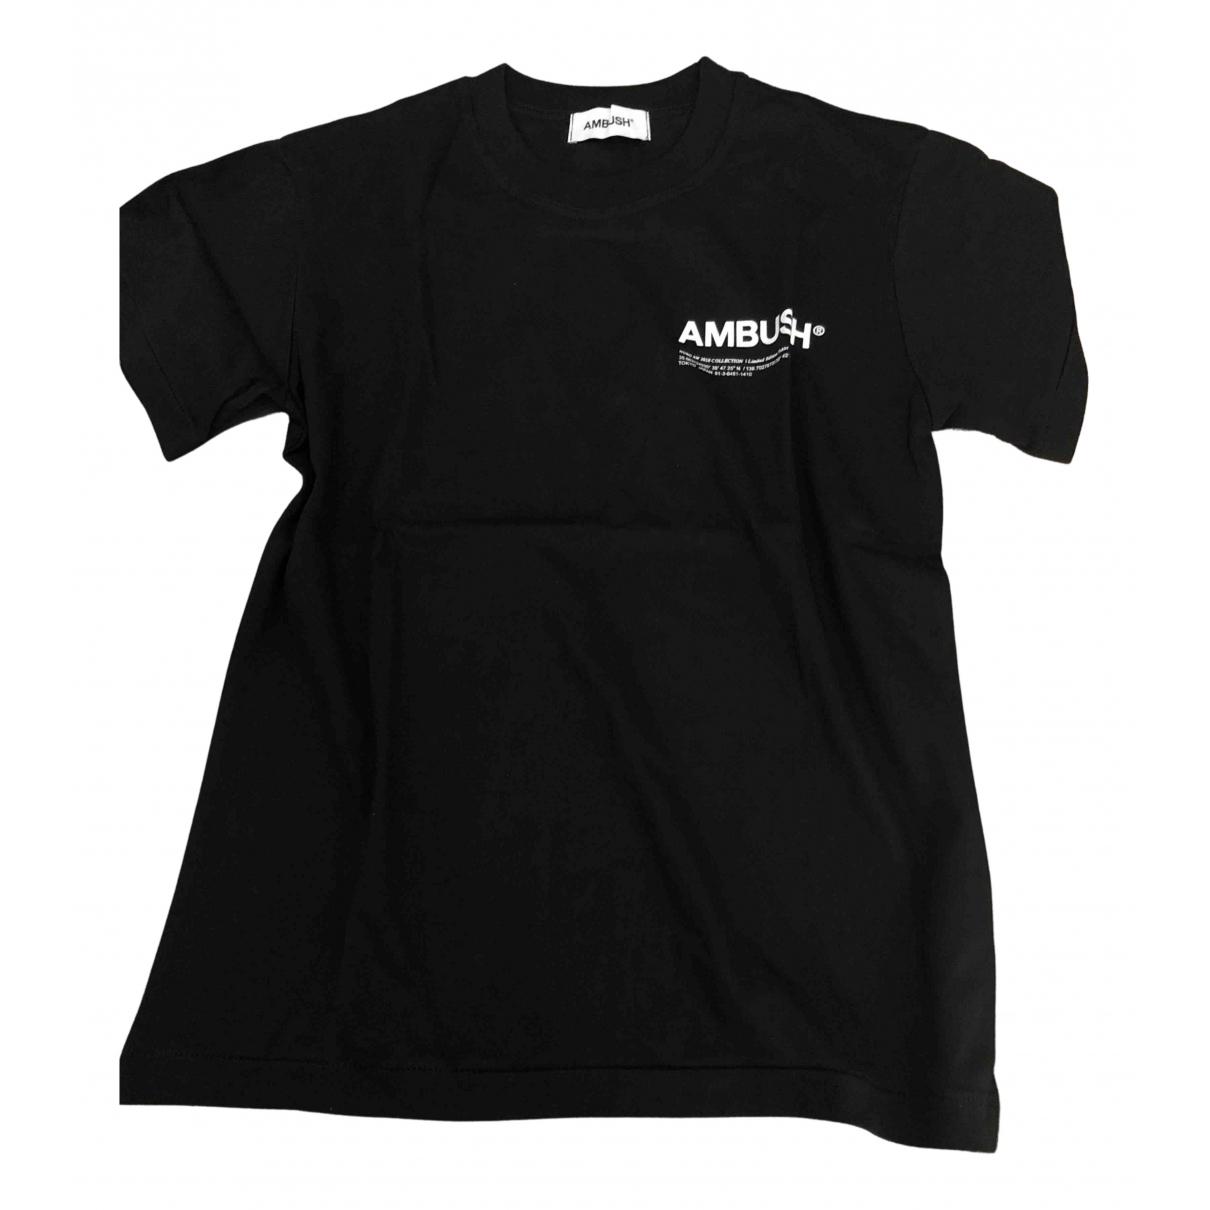 Ambush N Black Cotton T-shirts for Men 1 0 - 6